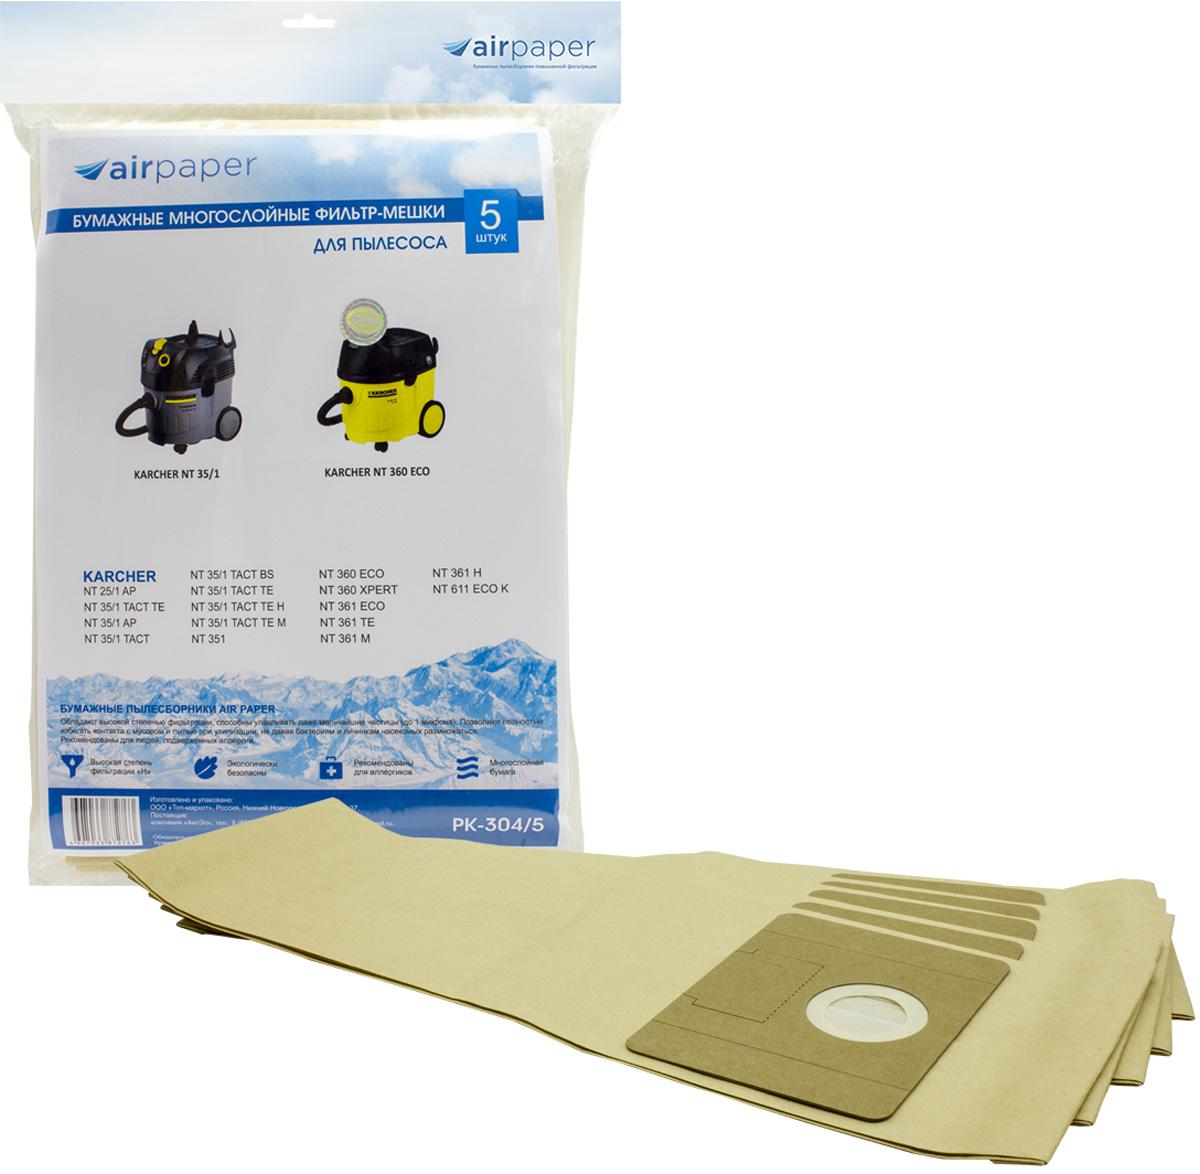 AIR Paper РК-304/5 пылесборники для пылесоса KARCHER, 5 шт air paper рк 218 5 пылесборники для пылесоса karcher 5 шт